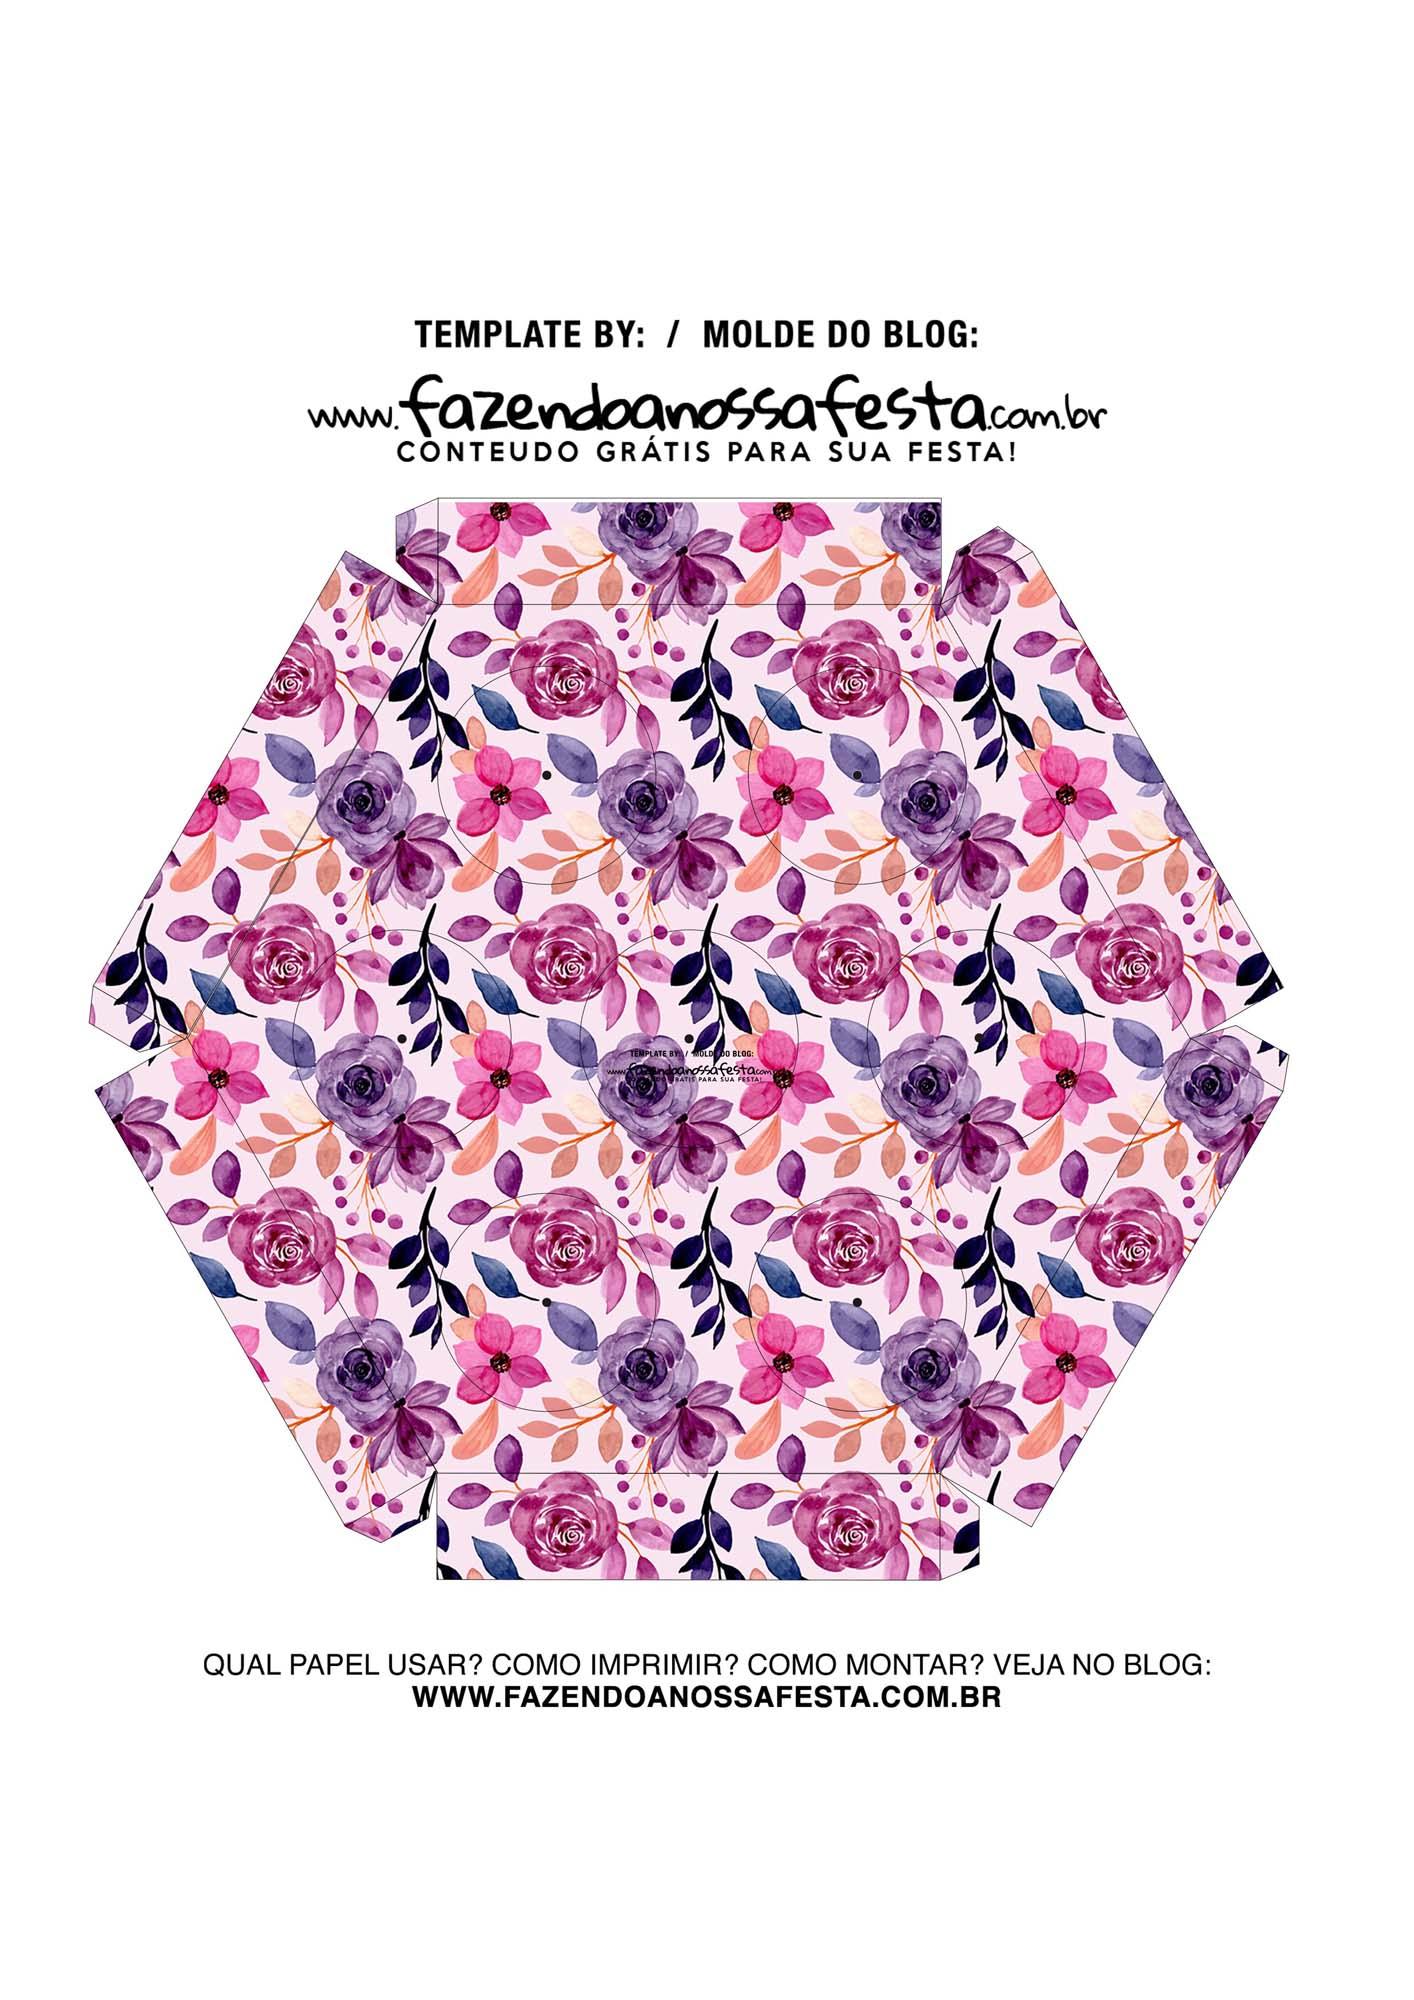 Caixa Explosiva Dia das Maes floral rosa e roxo 6